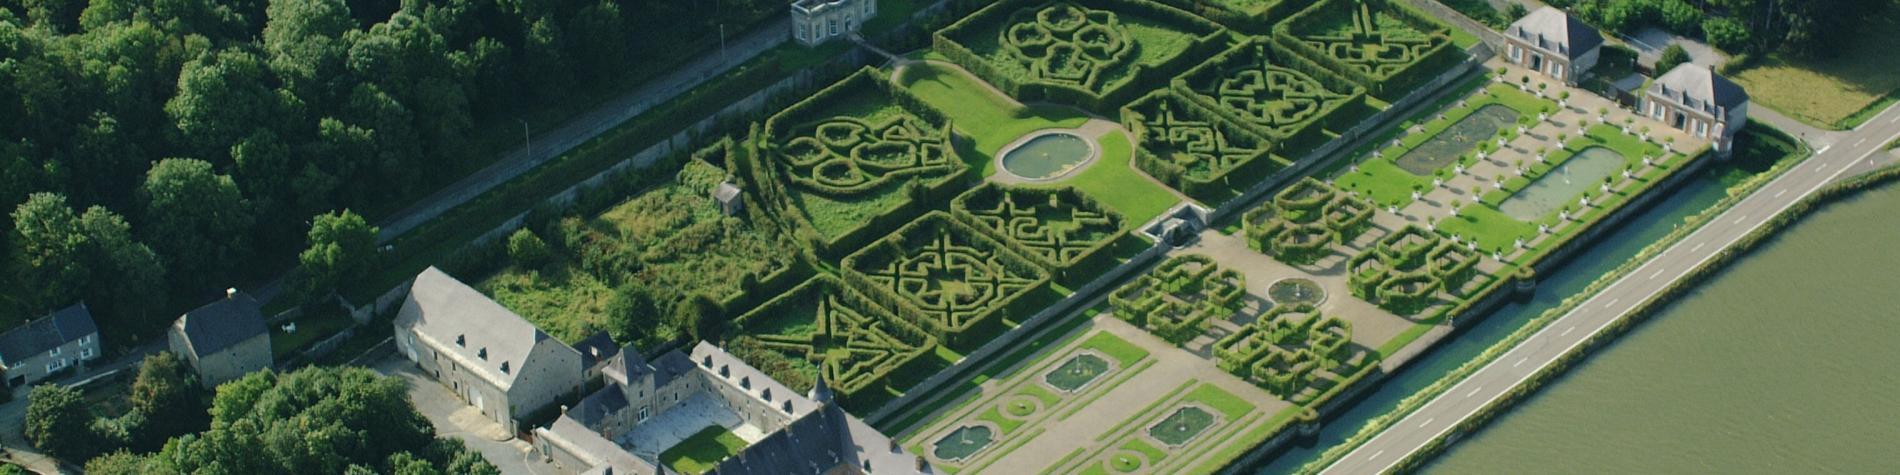 Château - Freÿr-sur-Meuse - jardins